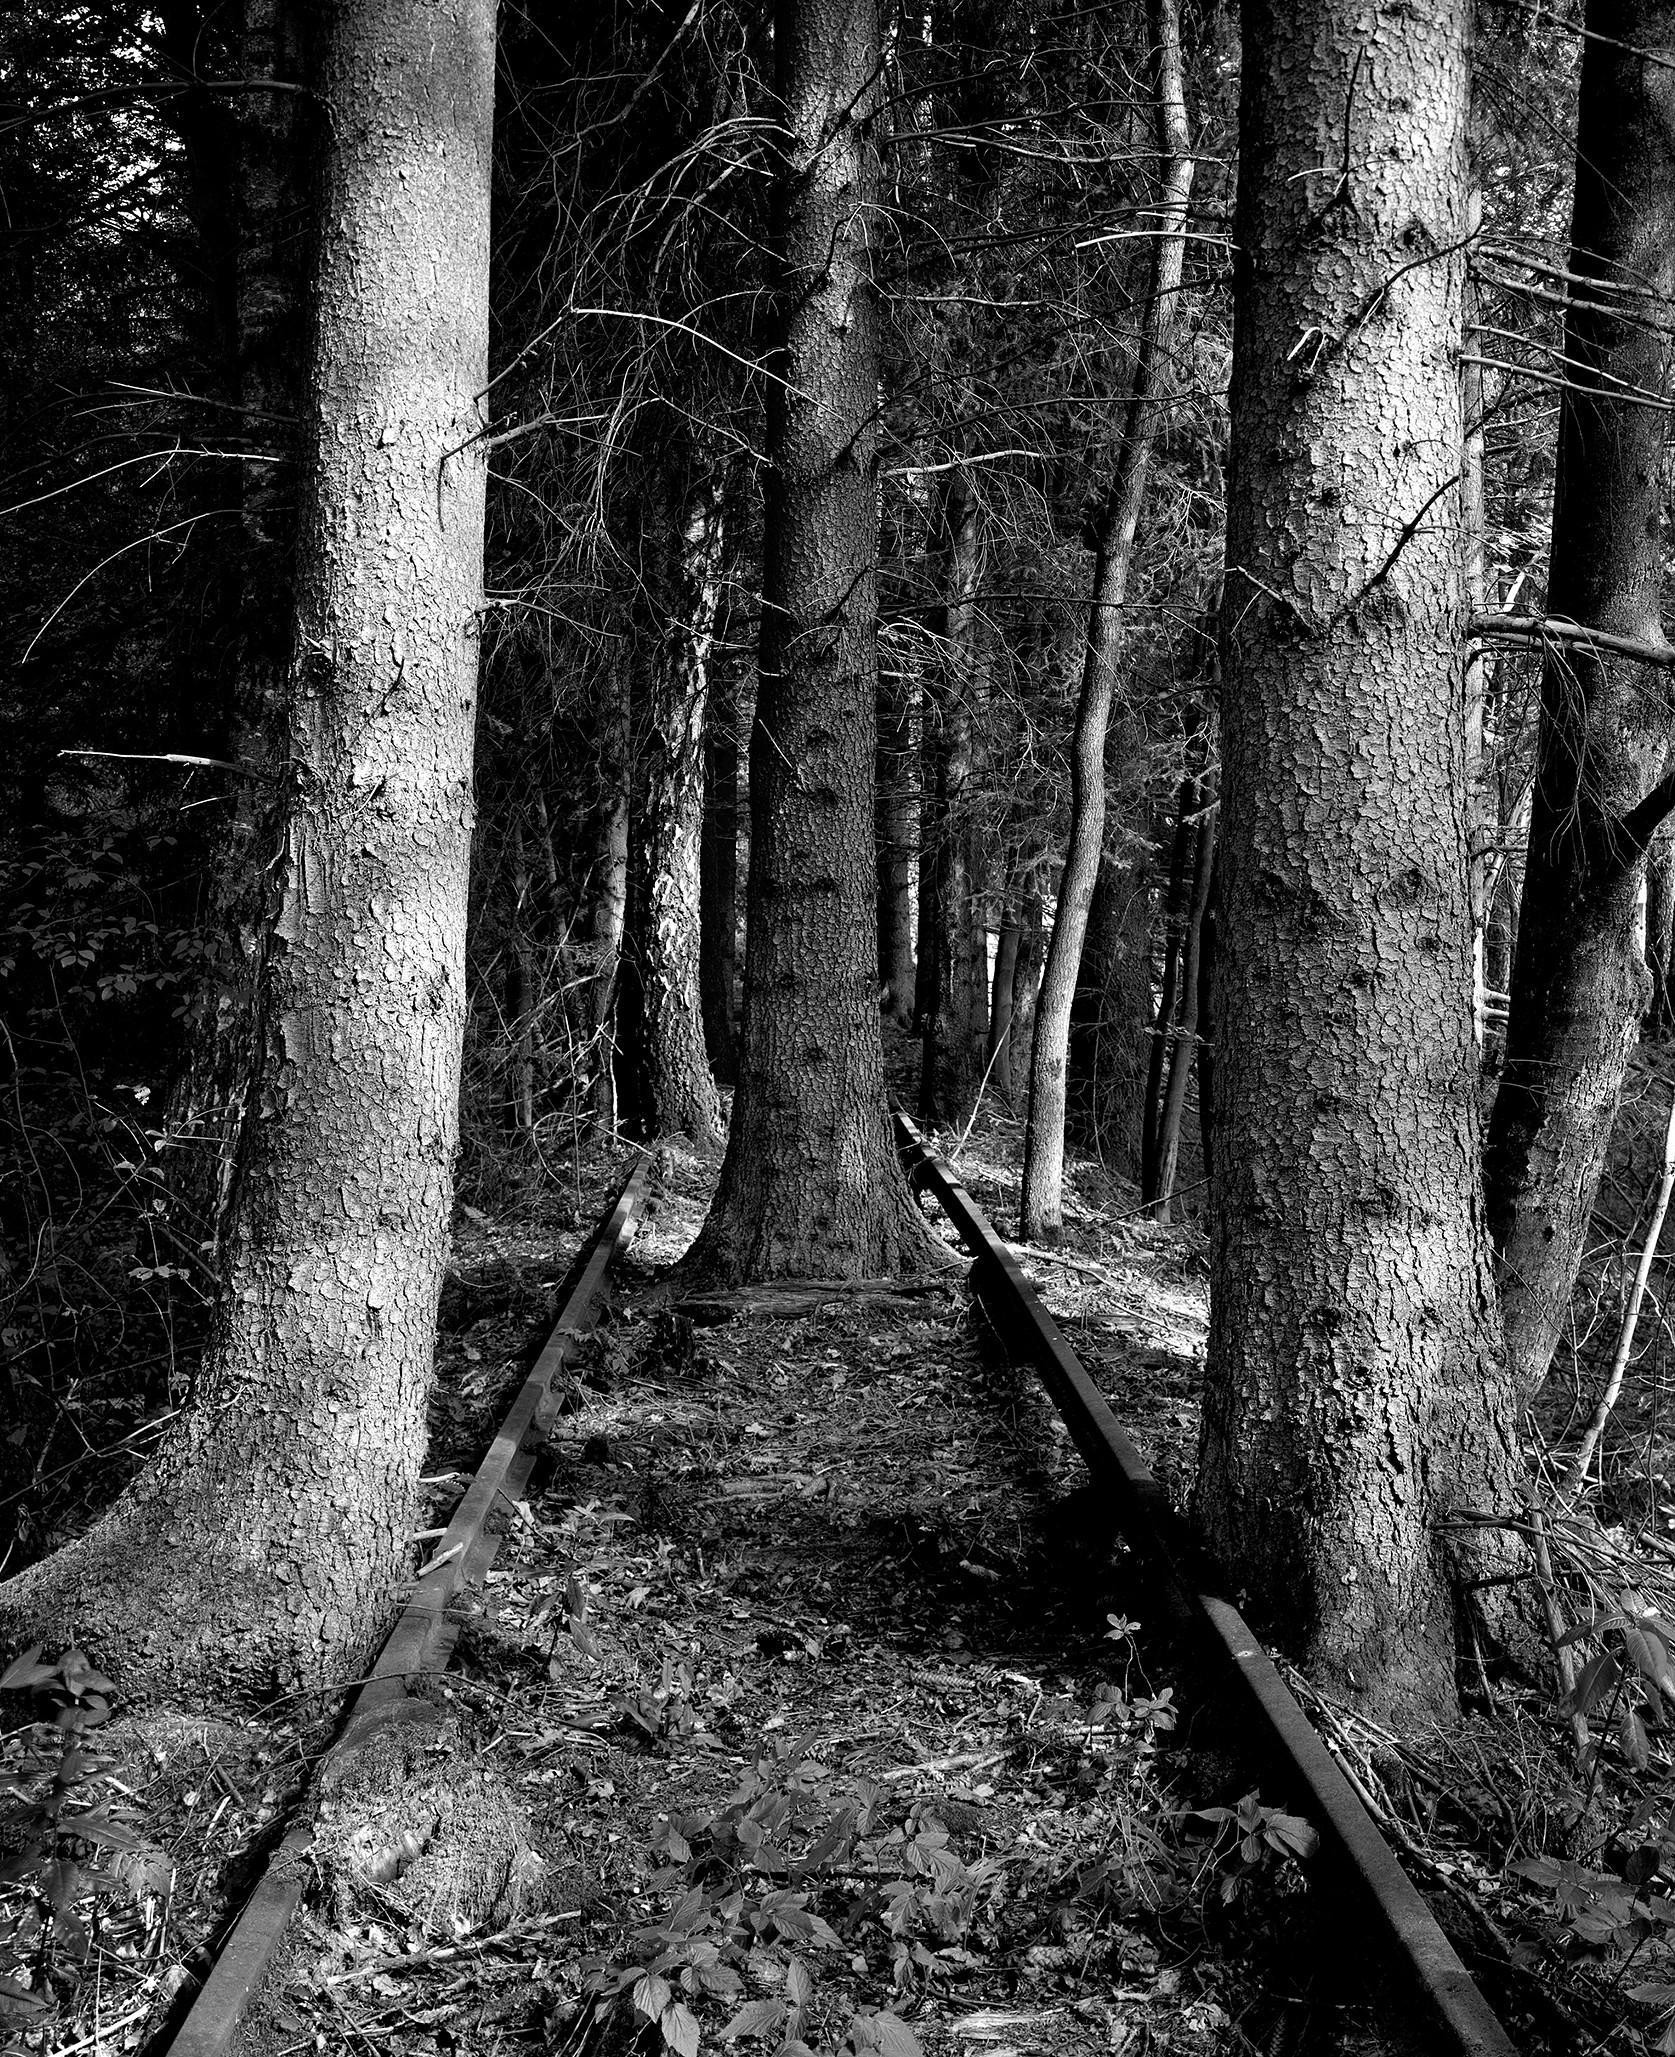 Ute Mahler; Werner Mahler Tettau-Talbahn, Grenze Thüringen / Bayern, 2012.  Aus der Serie » Wo die Welt zu Ende war«, 2010 - 2012 © Ute Mahler, Werner Mahler